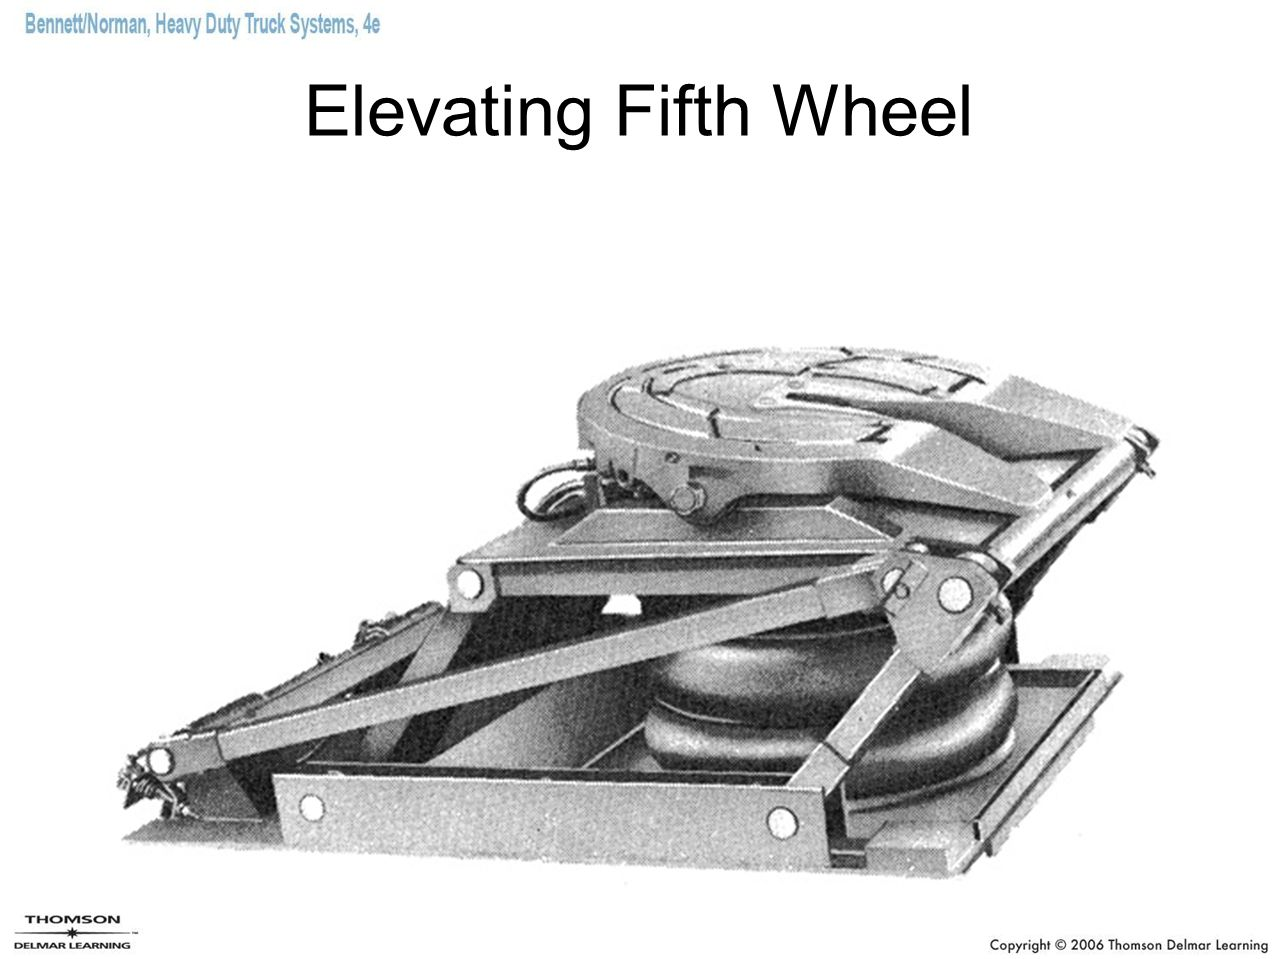 Elevating Fifth Wheel